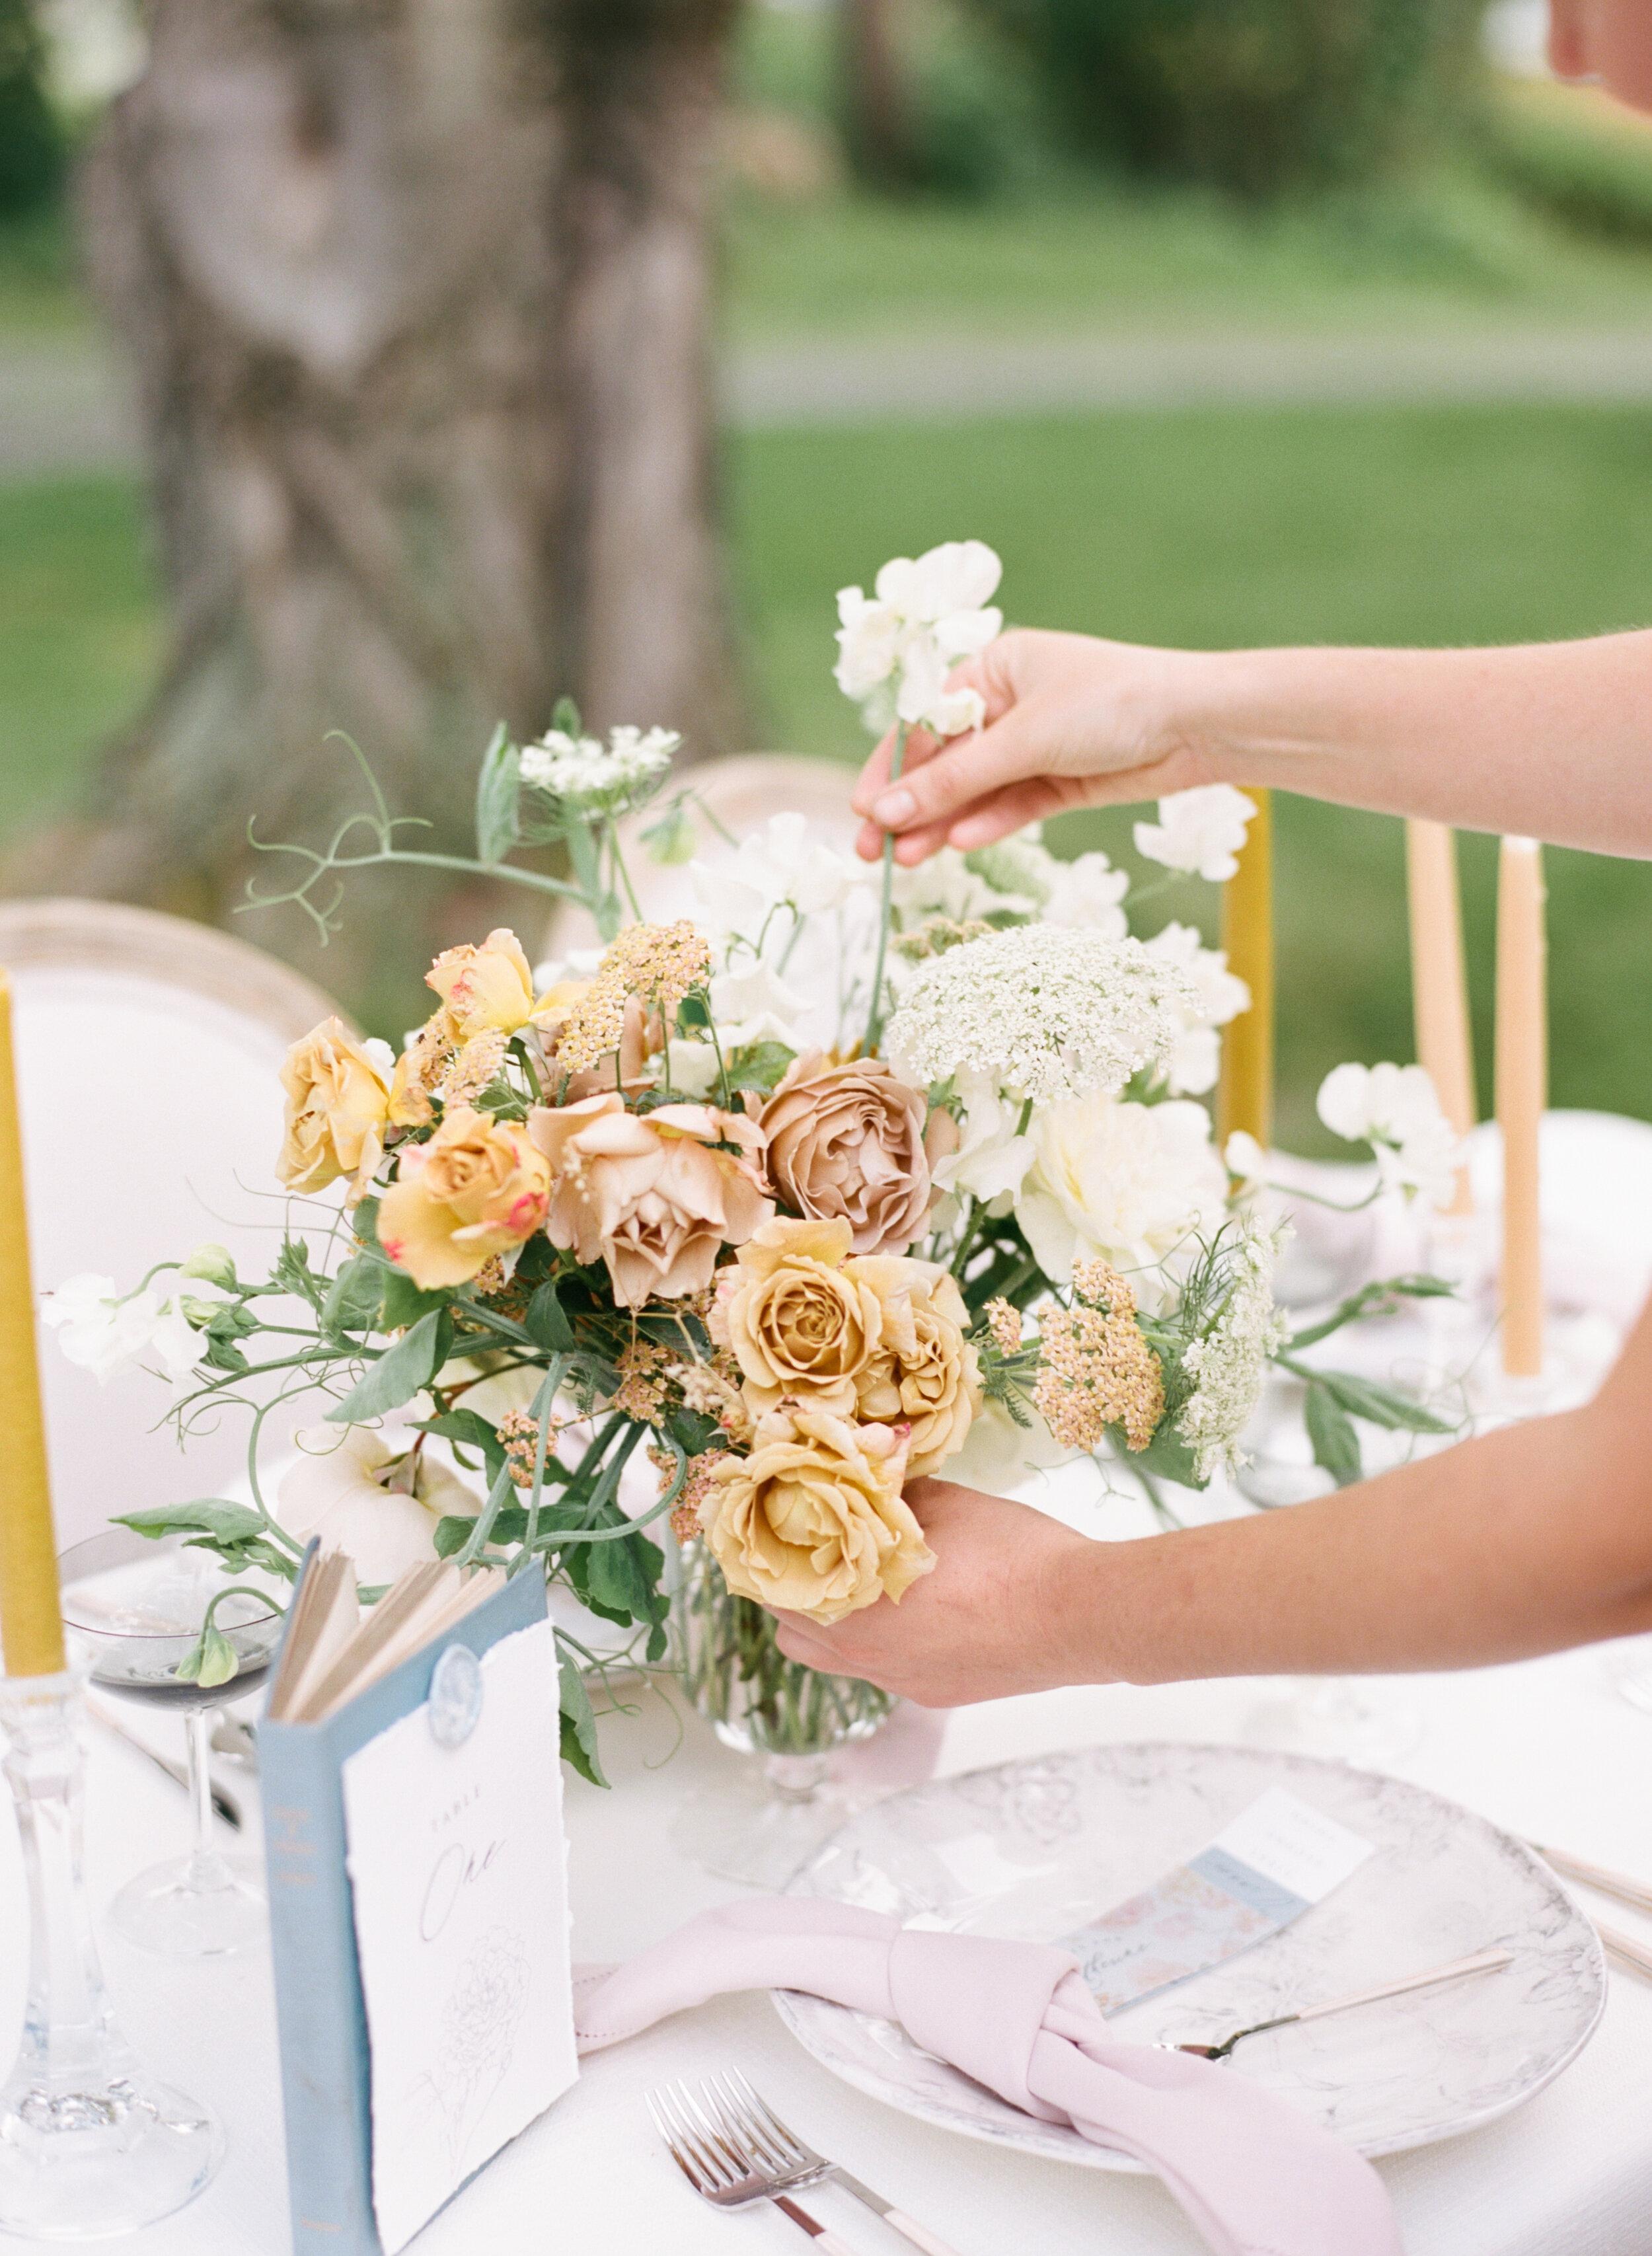 alexandra-meseke-understated-soft-luxury-wedding-upstate-ny_0136.jpg